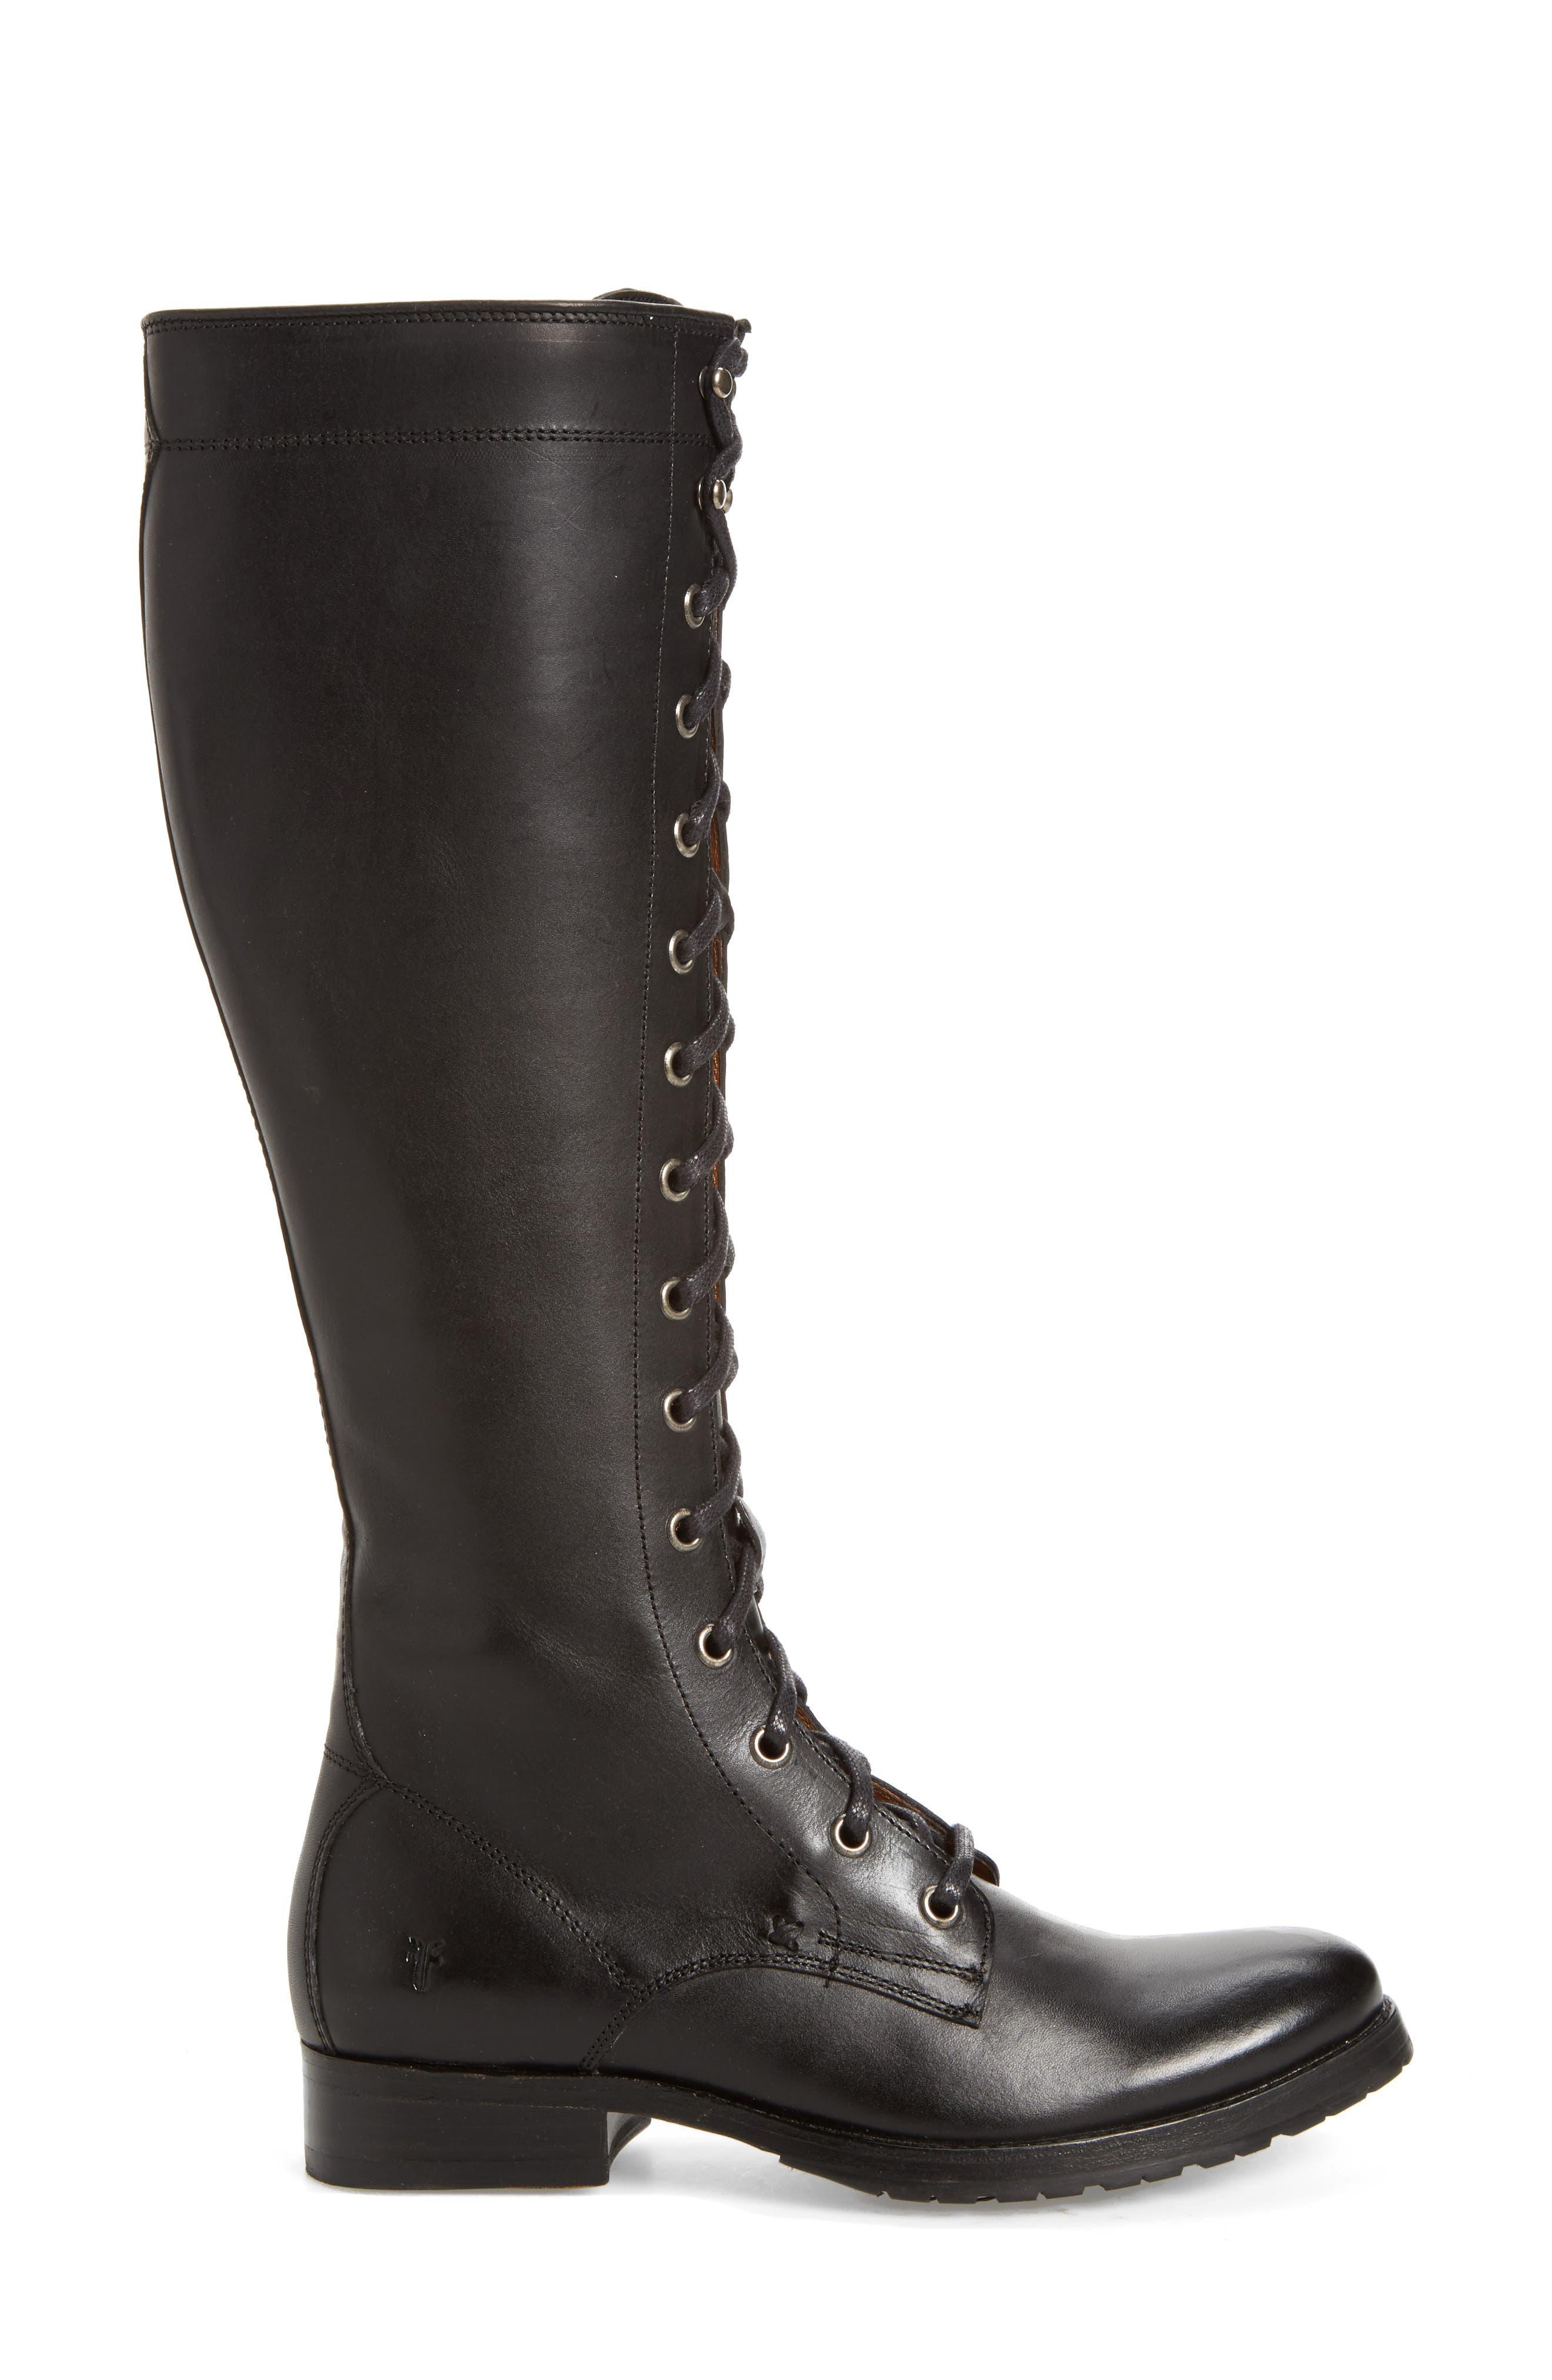 Alternate Image 3  - Frye Melissa Tall Lace-Up Boot (Women)